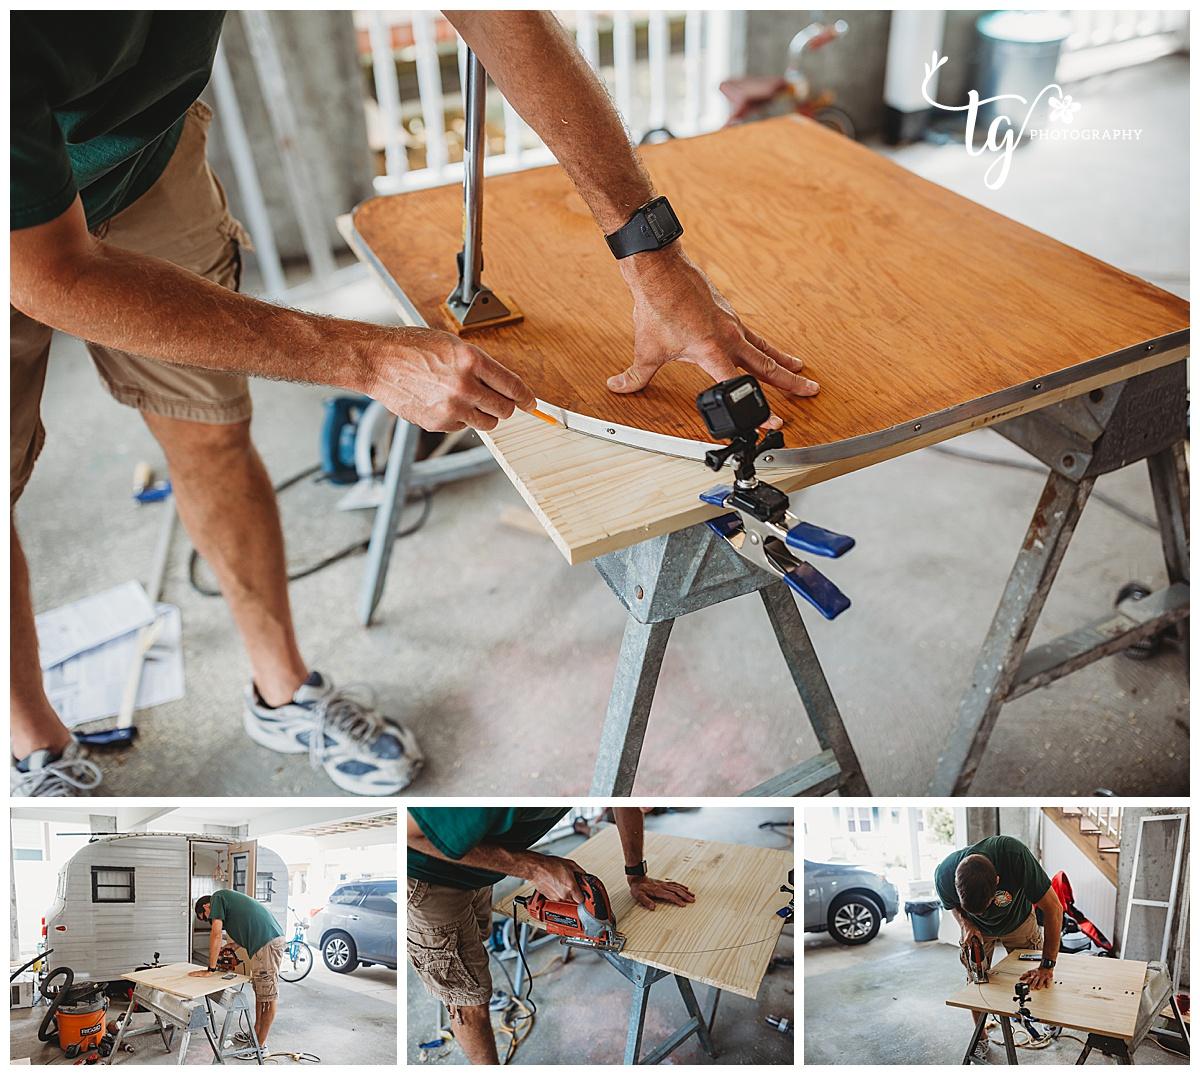 man building table for camper